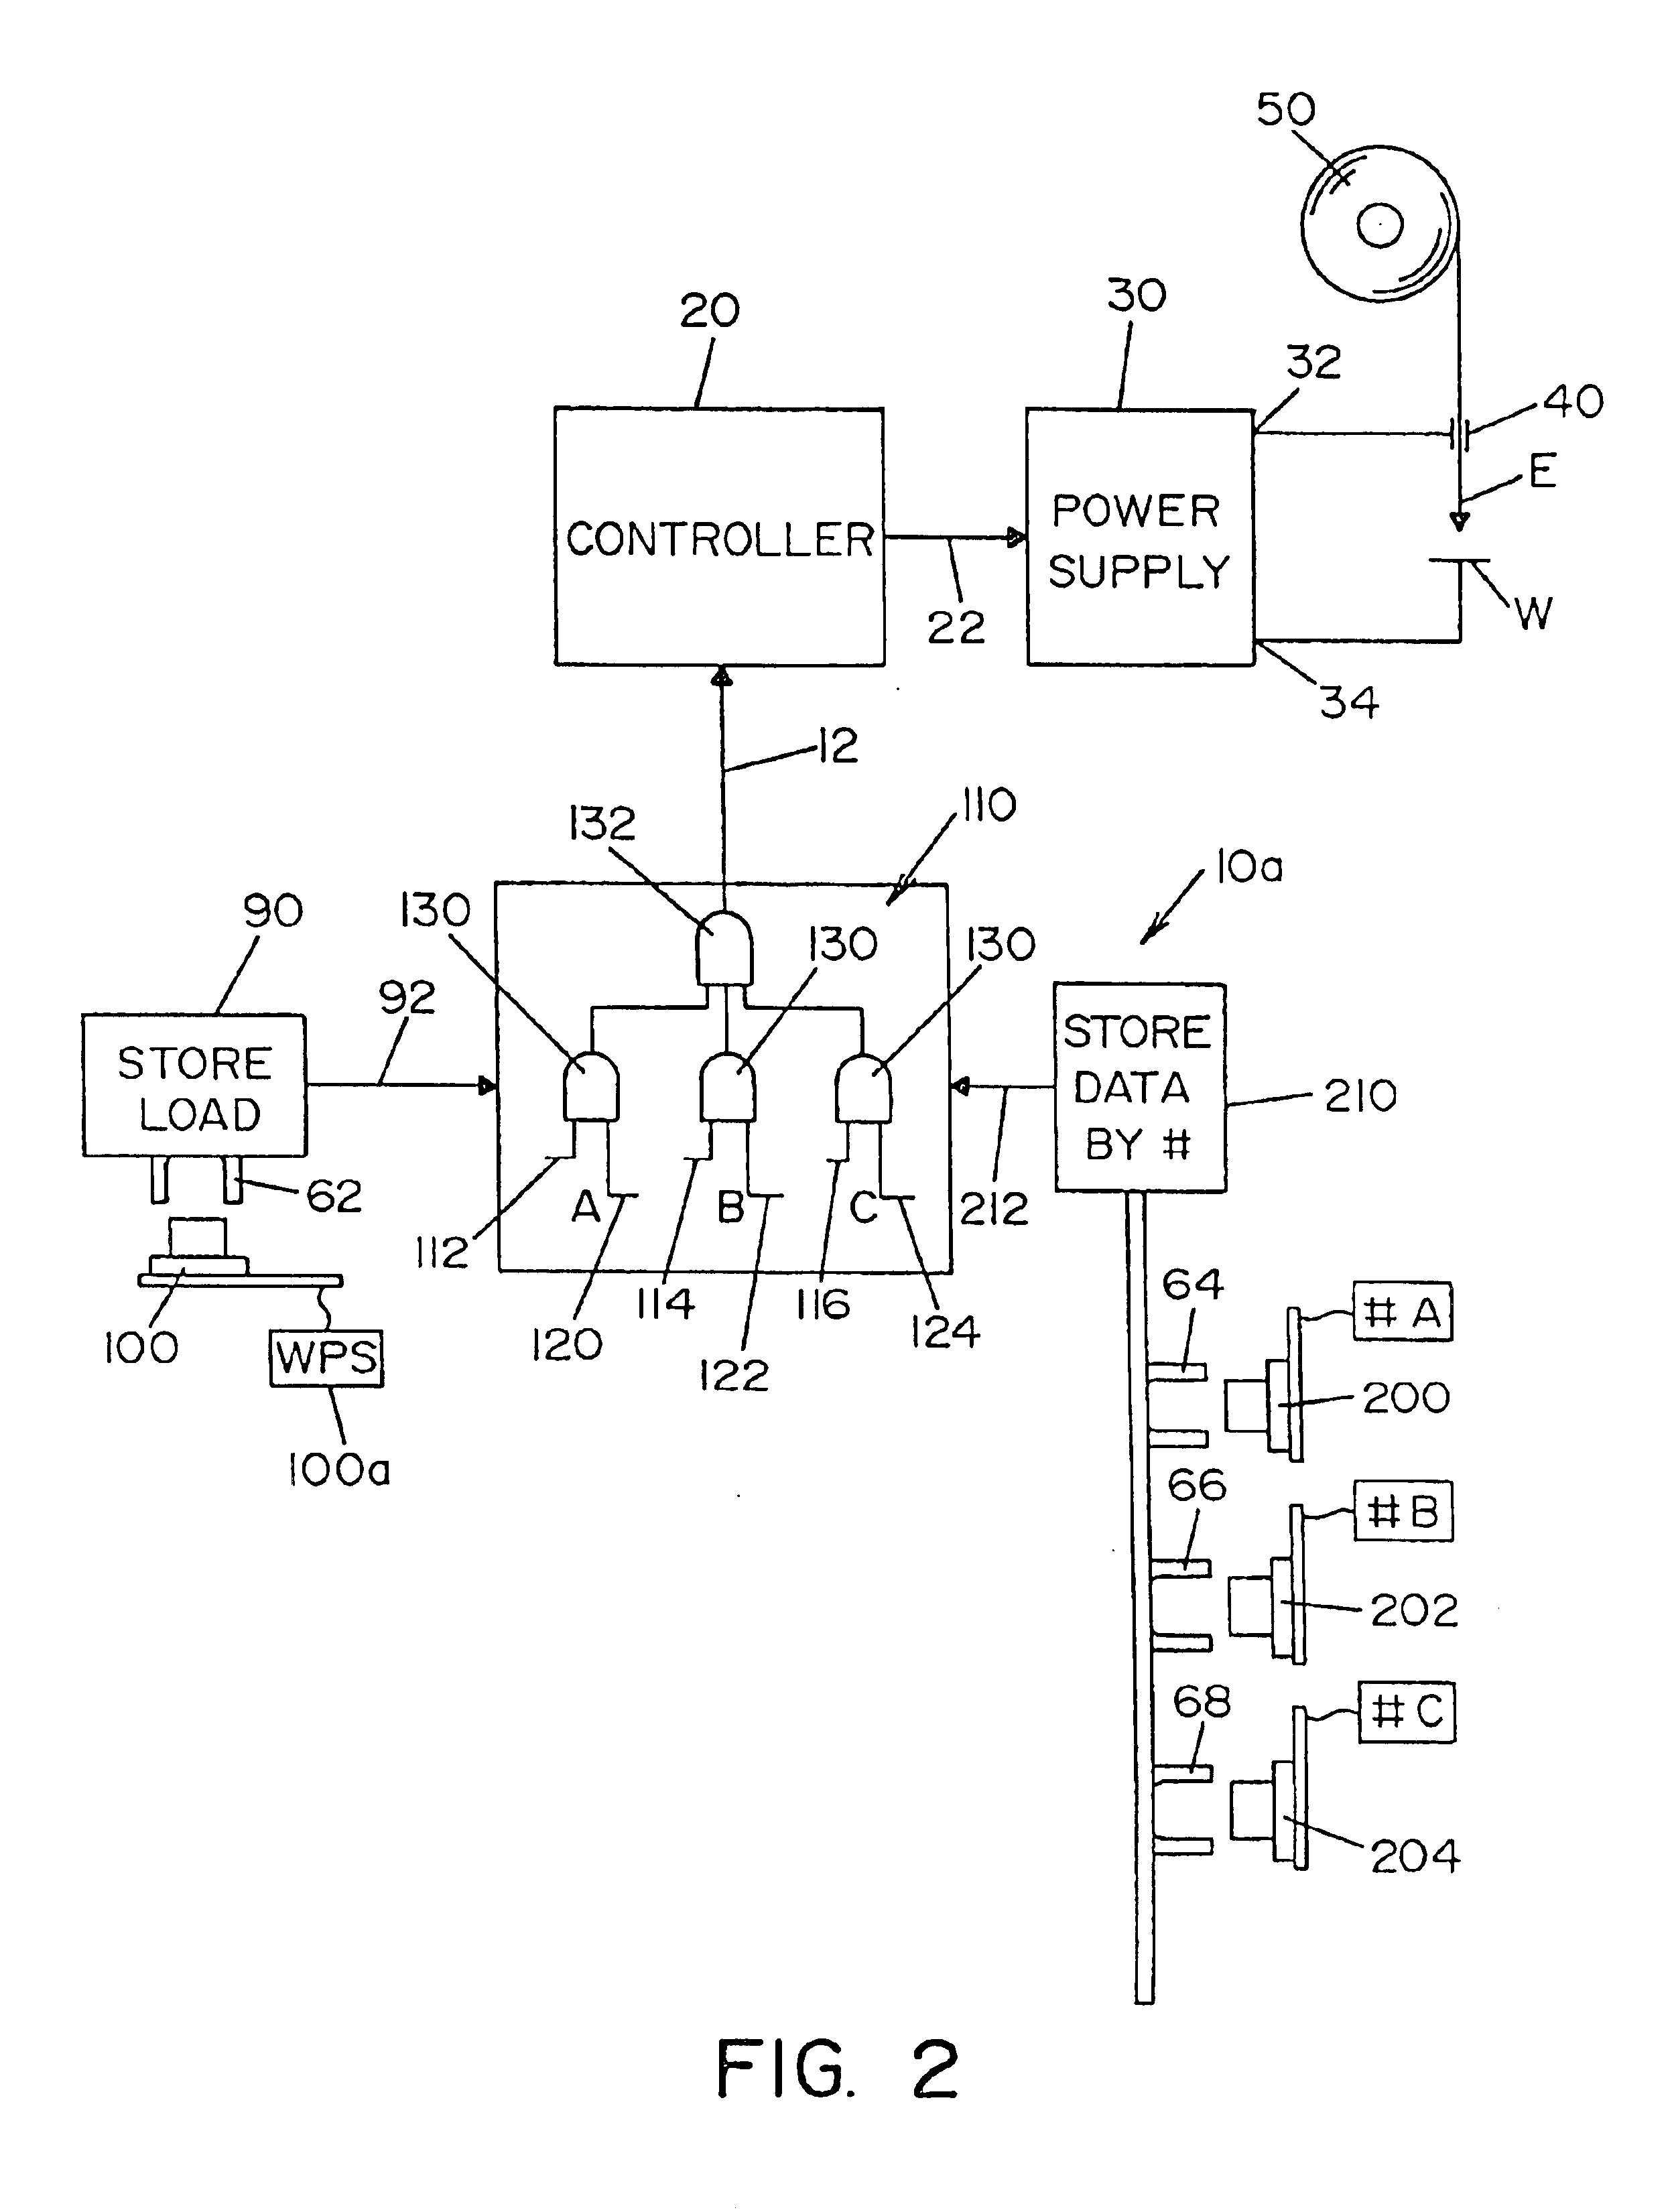 Danfoss Dc Drive Wiring Diagram Download Diagrams Vlt Alpha Motor Start Capacitor For 220v